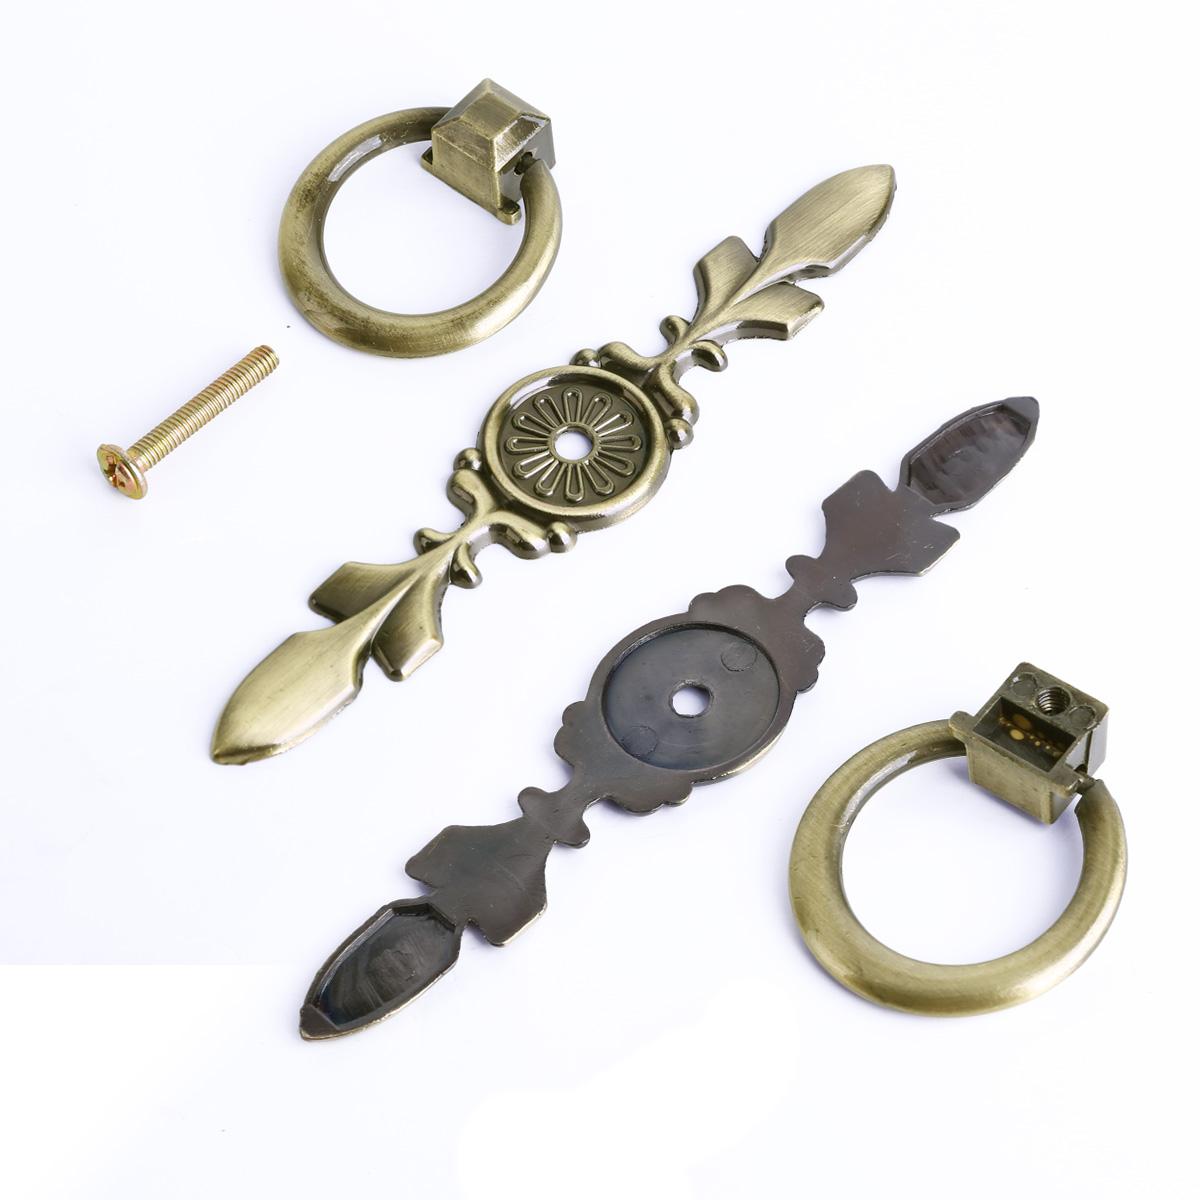 Vintage Chic Metal Drawer Pulls Antique Brass Door